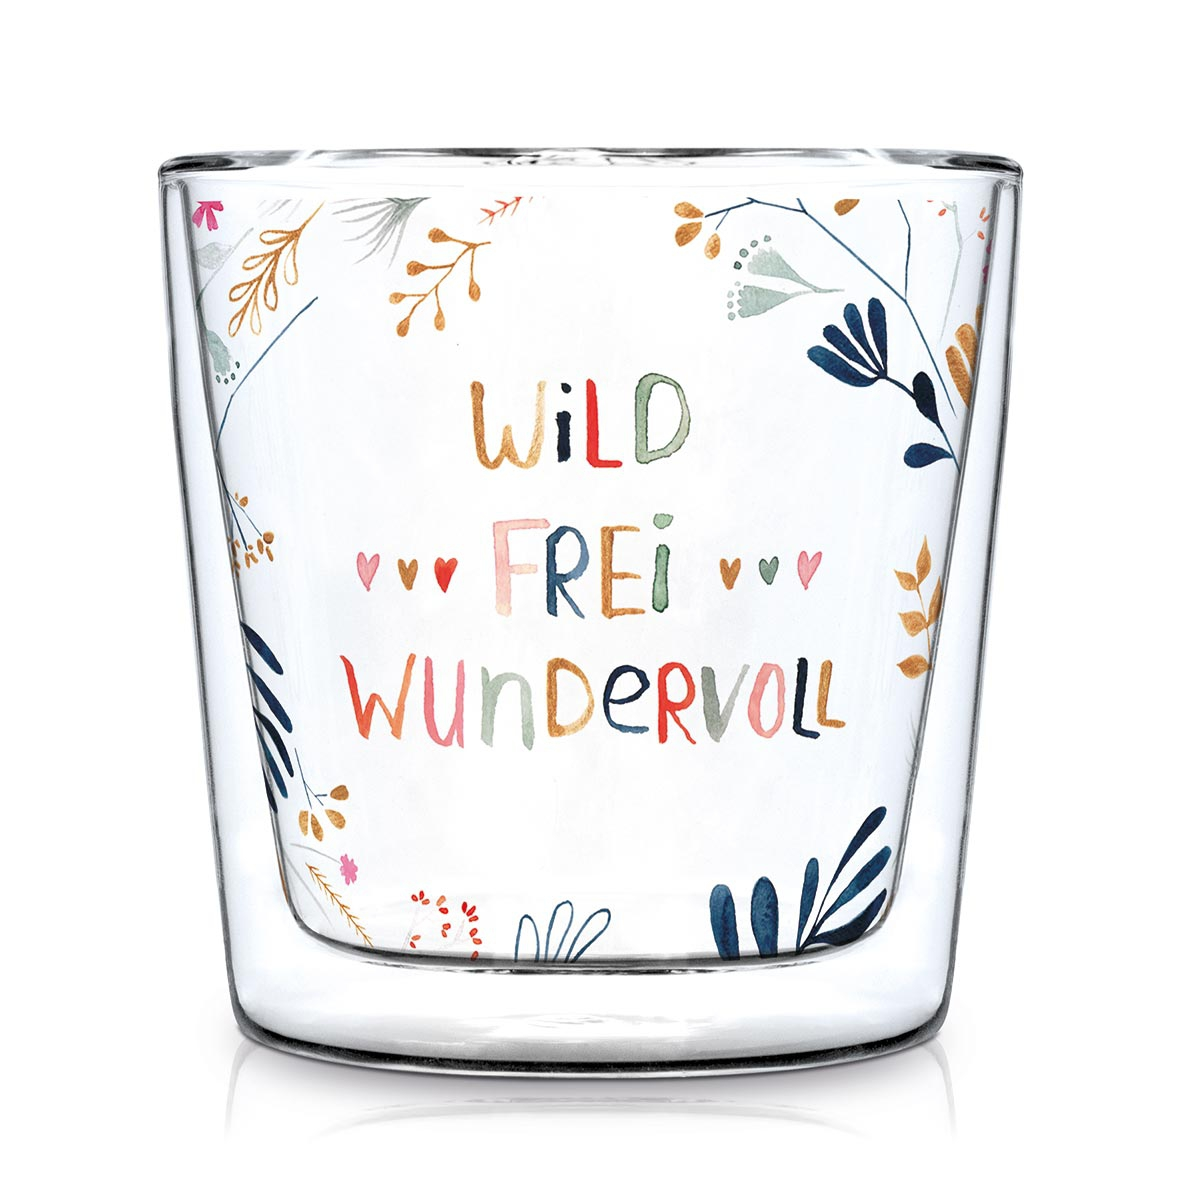 Doppelwand Glas 0,3 L - Wild, Frei, Wundervoll Trendglas DW